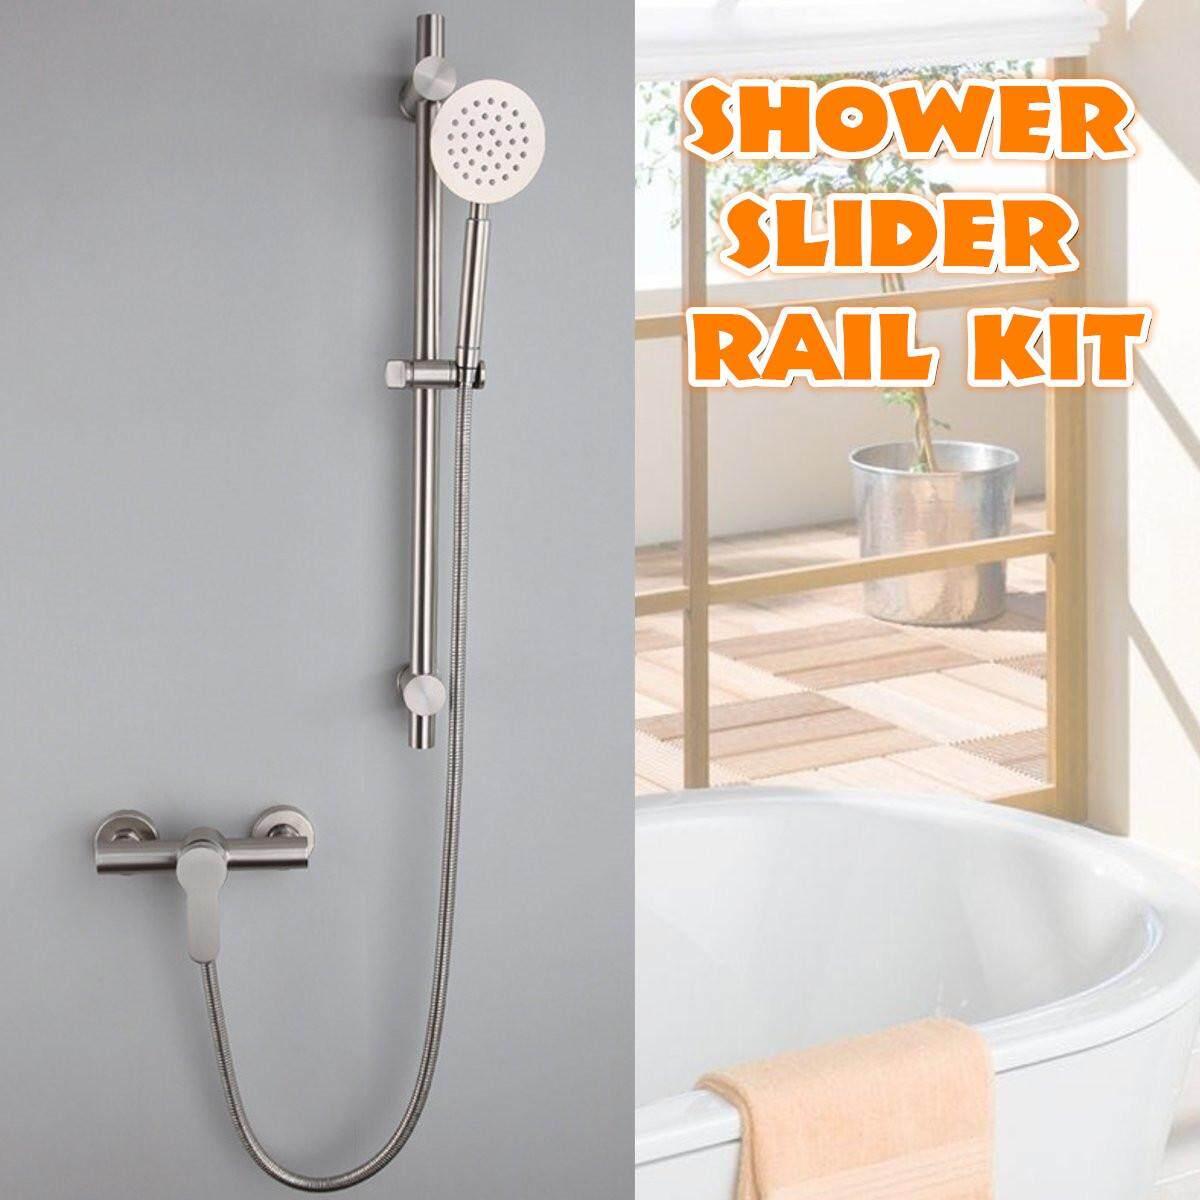 Stainless Steel Adjustable Shower Slider Riser Rail Bar Kit Head Hose Set System